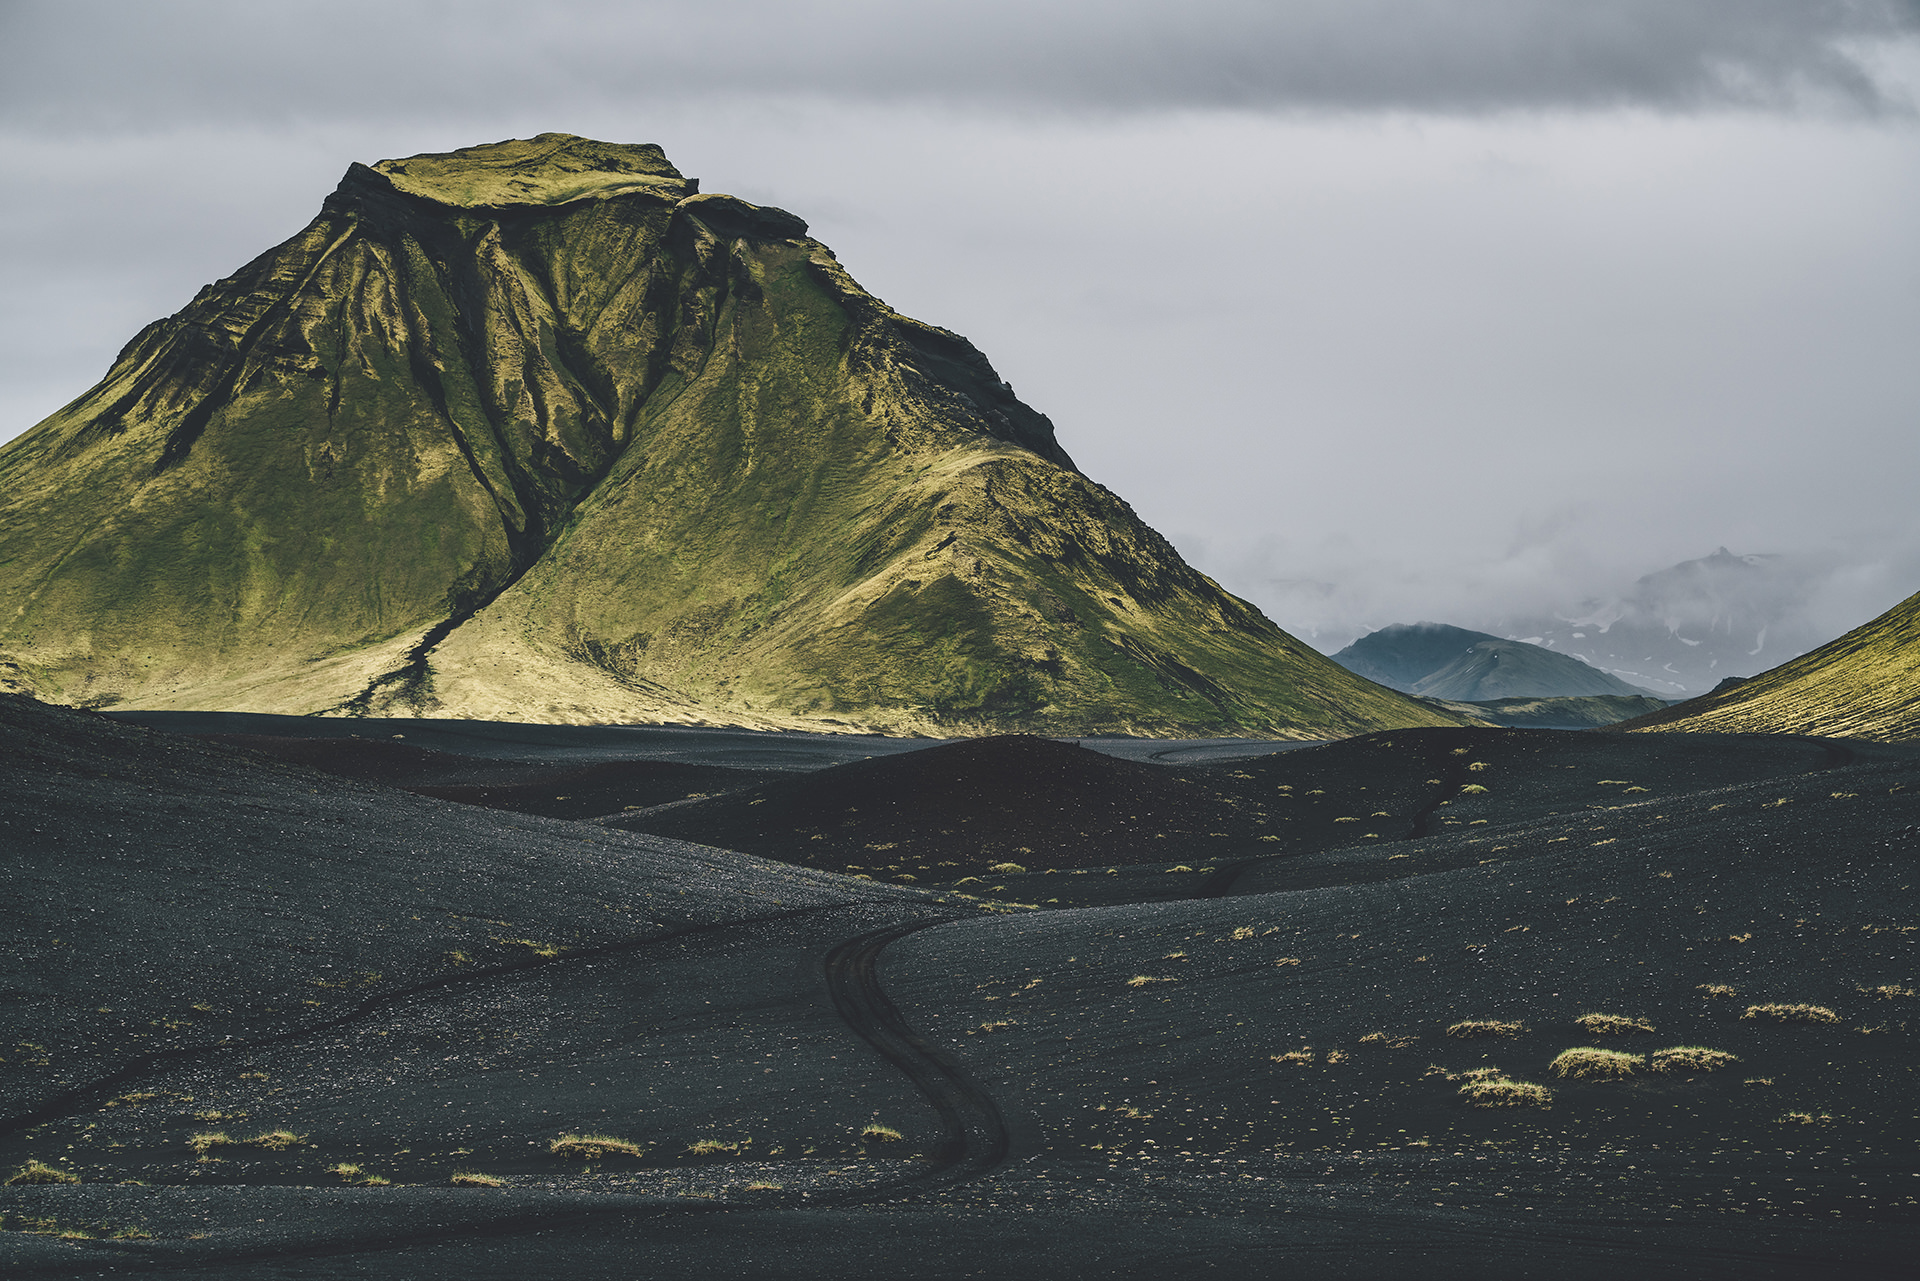 island-vulkanstein-berg-gruen-travel